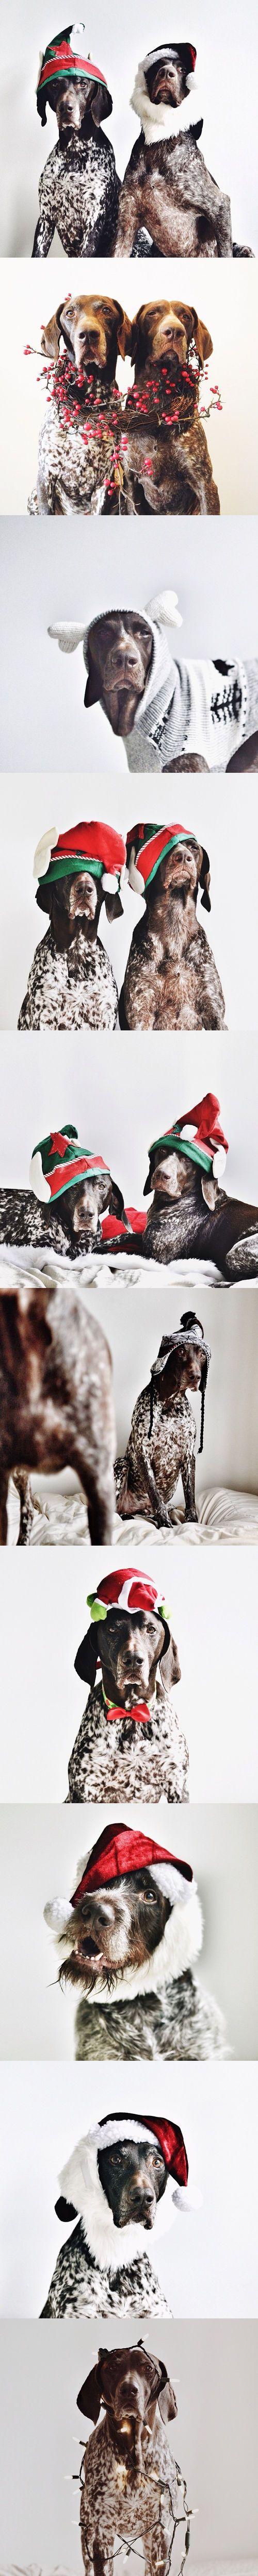 Gus & Travis - Christmas Photos - #GSP German Shorthaired Pointer #braque allemand